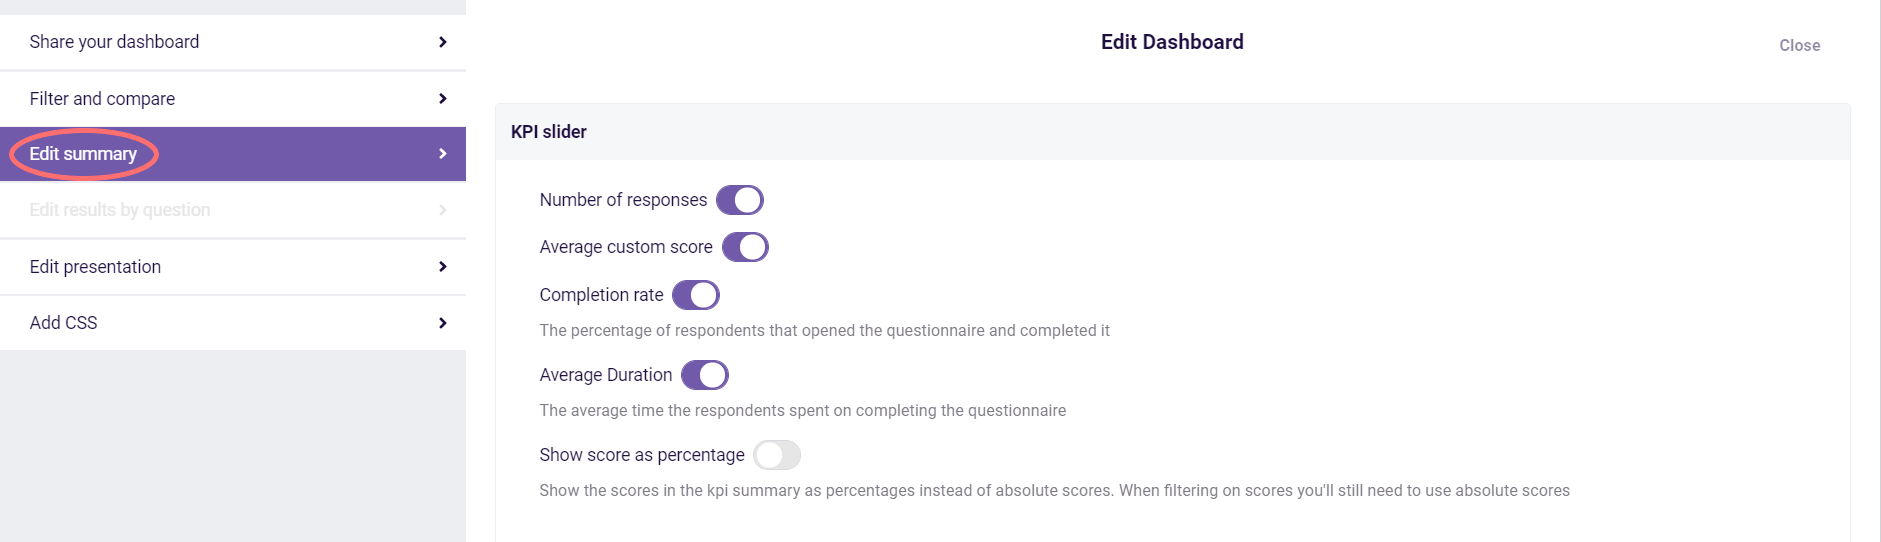 insights view- edit dashboard